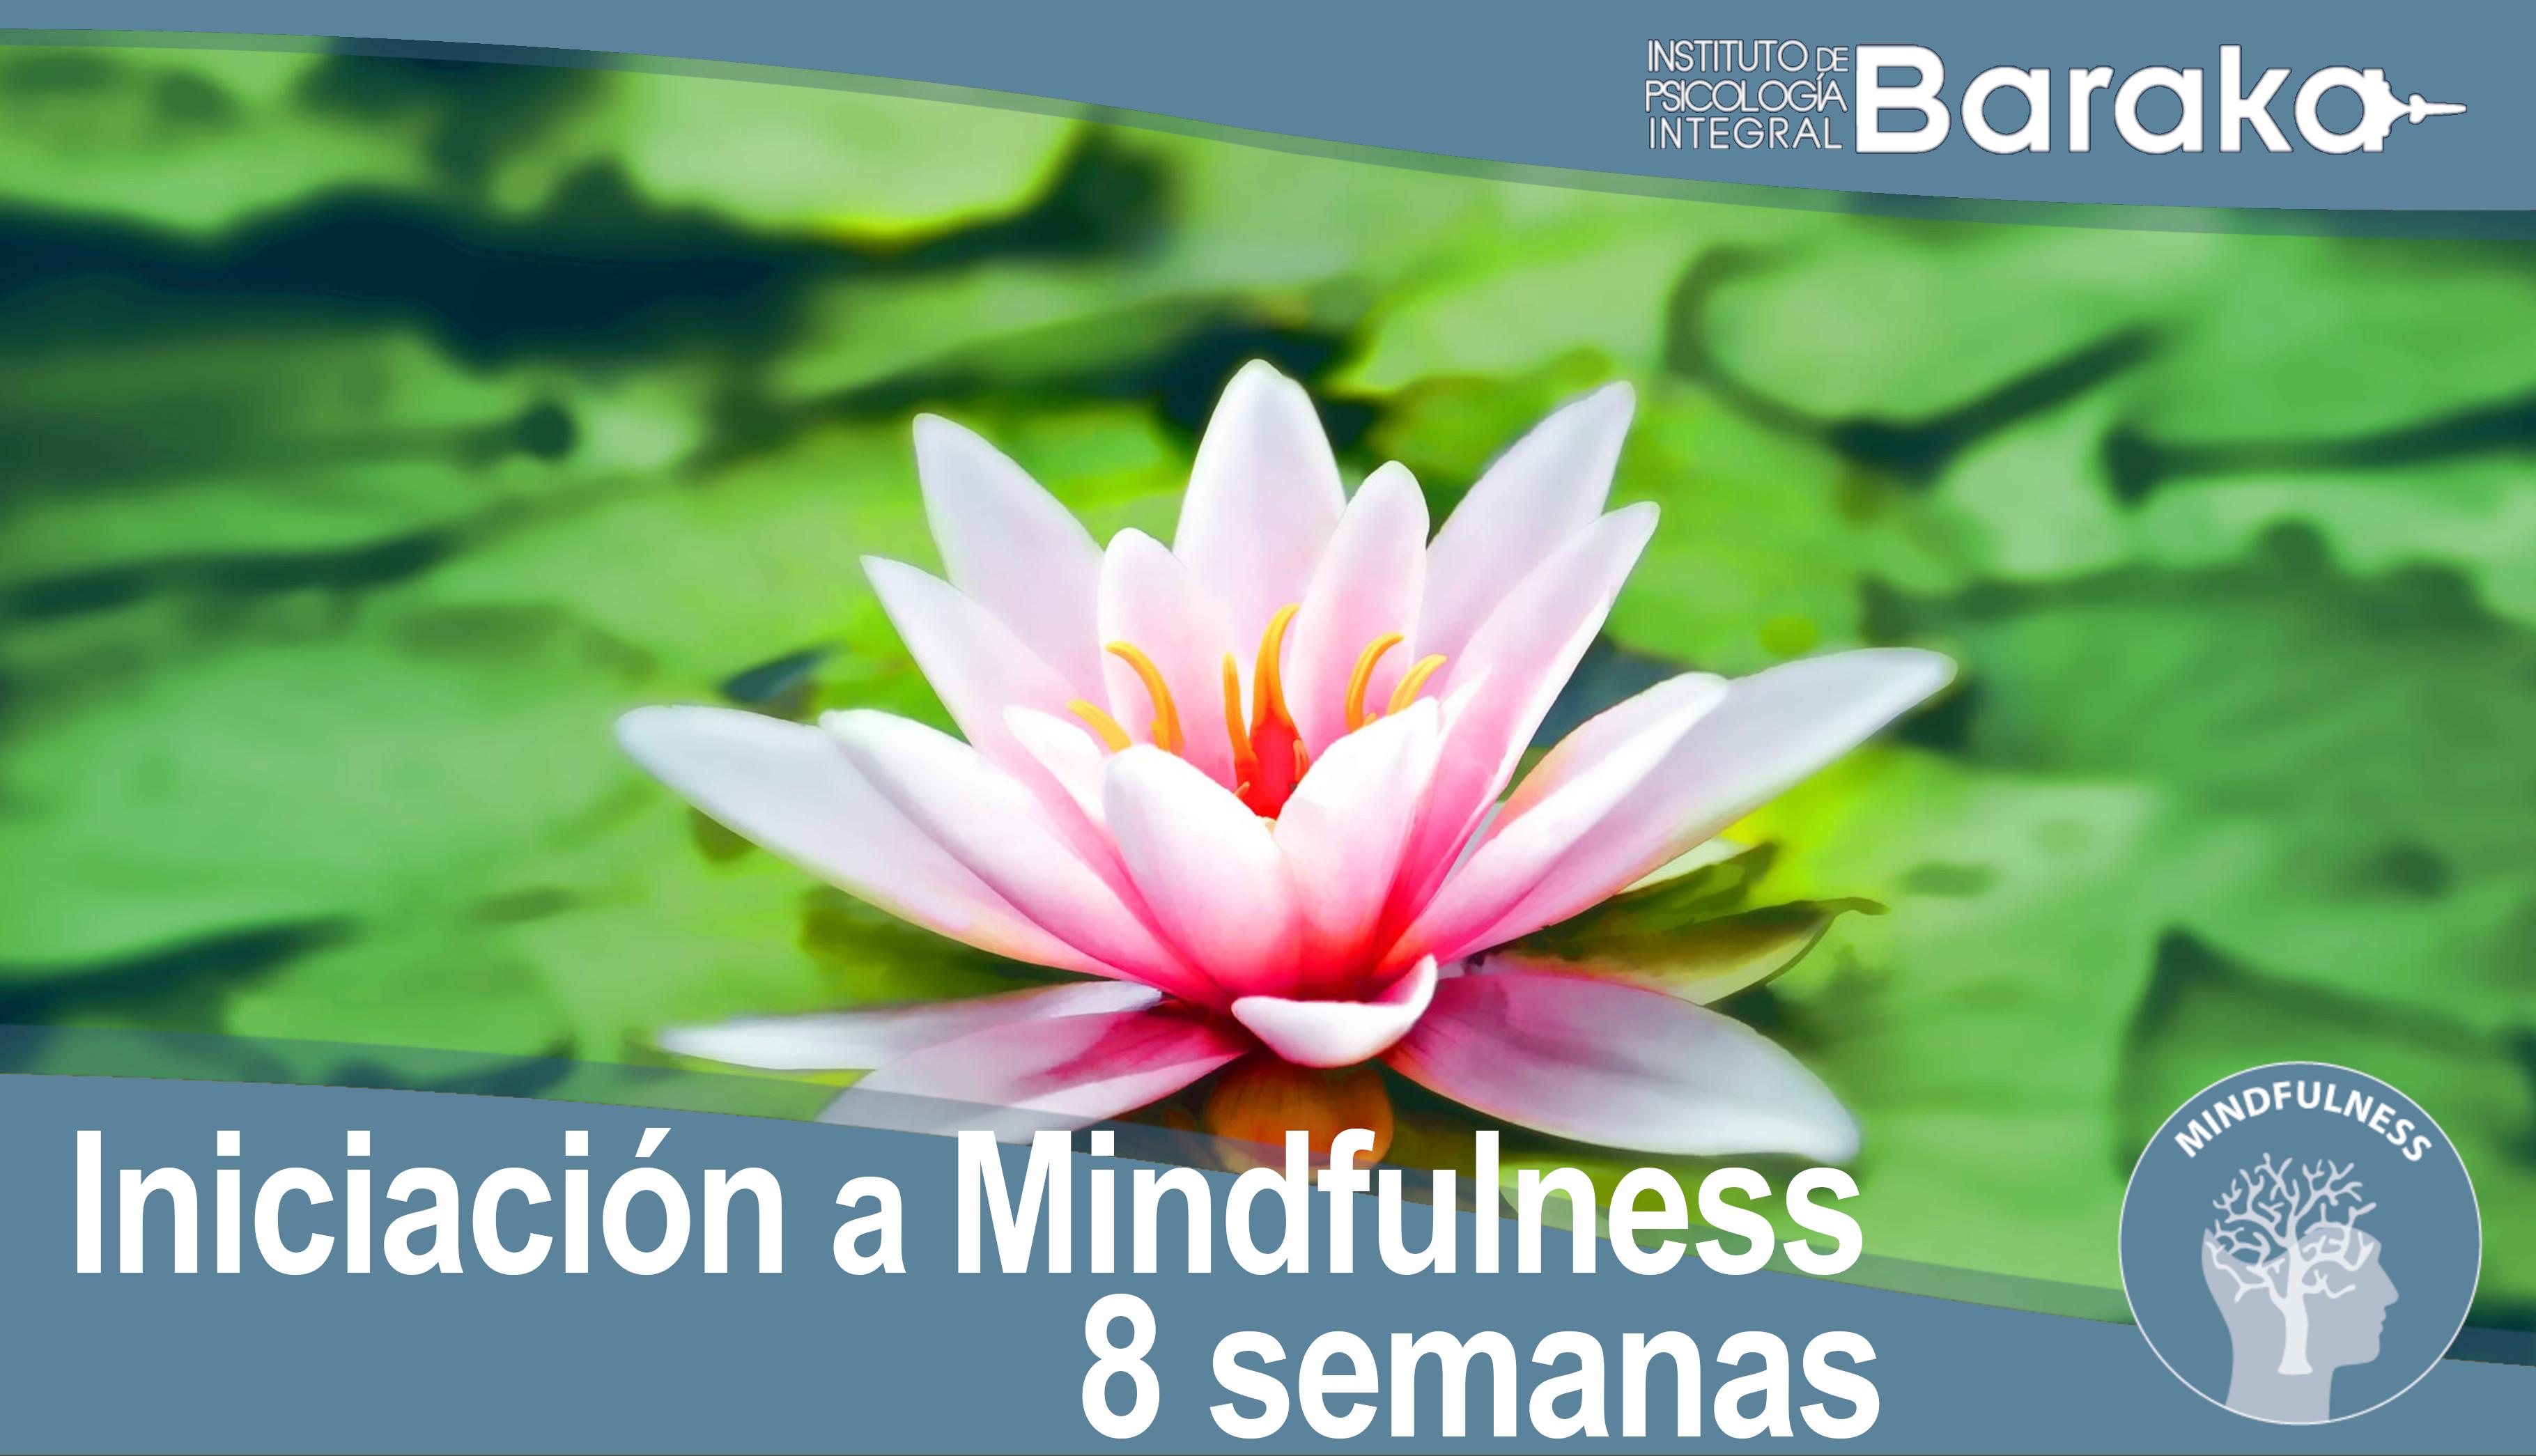 iniciacion mindfulness baraka